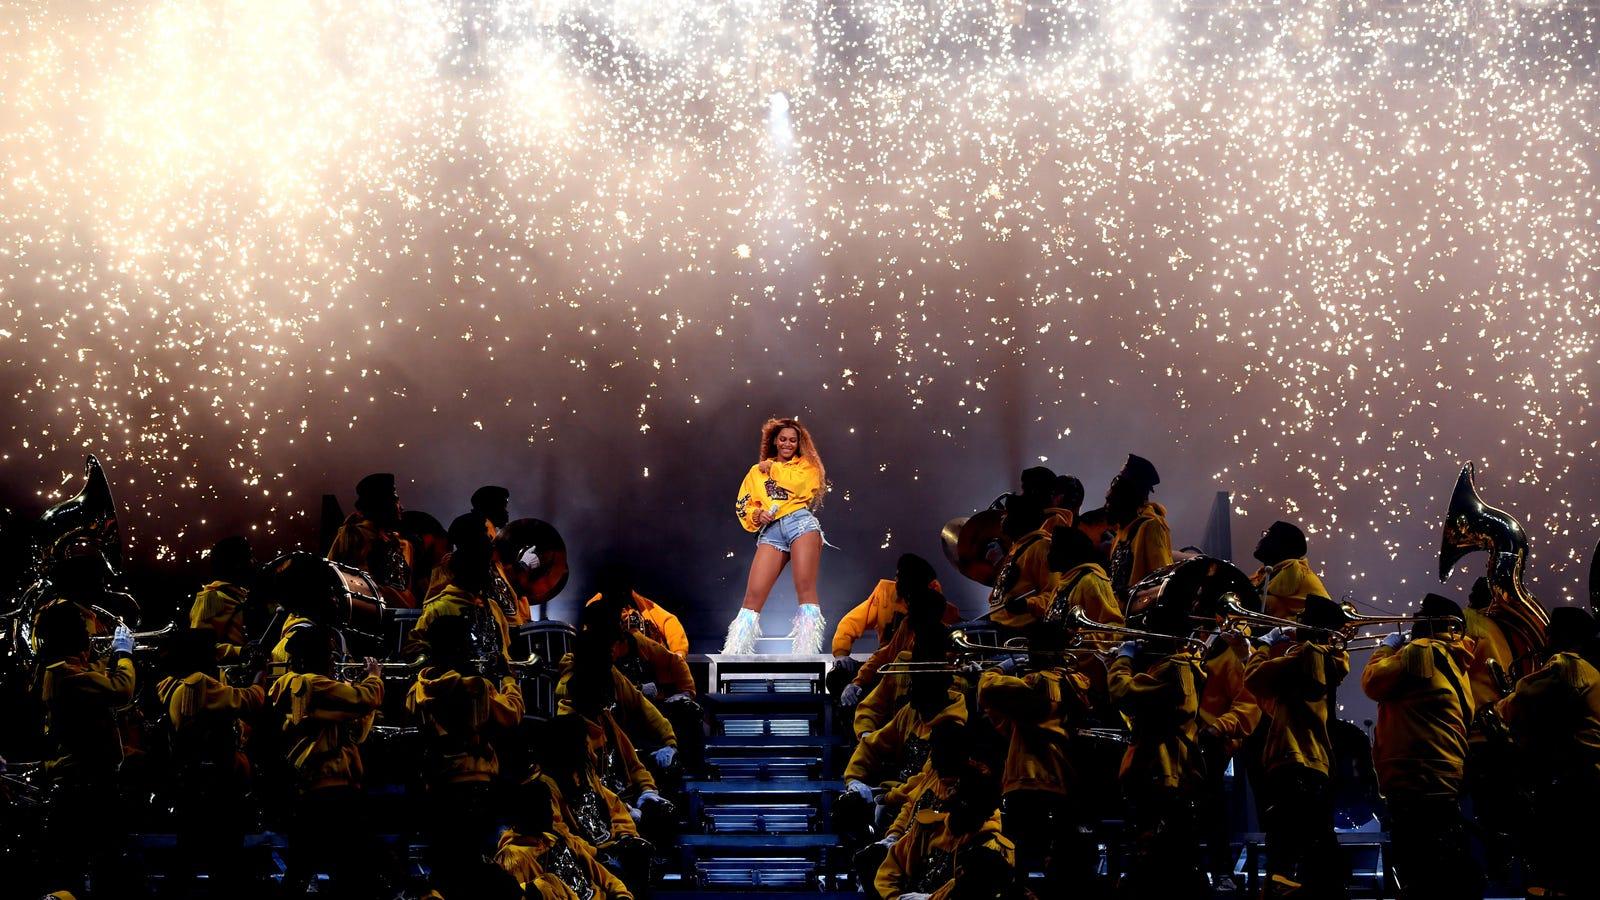 Beyoncé's Homecoming: Blackest Coachella Performance Naturally Brings Netflix's Blackest Ratings